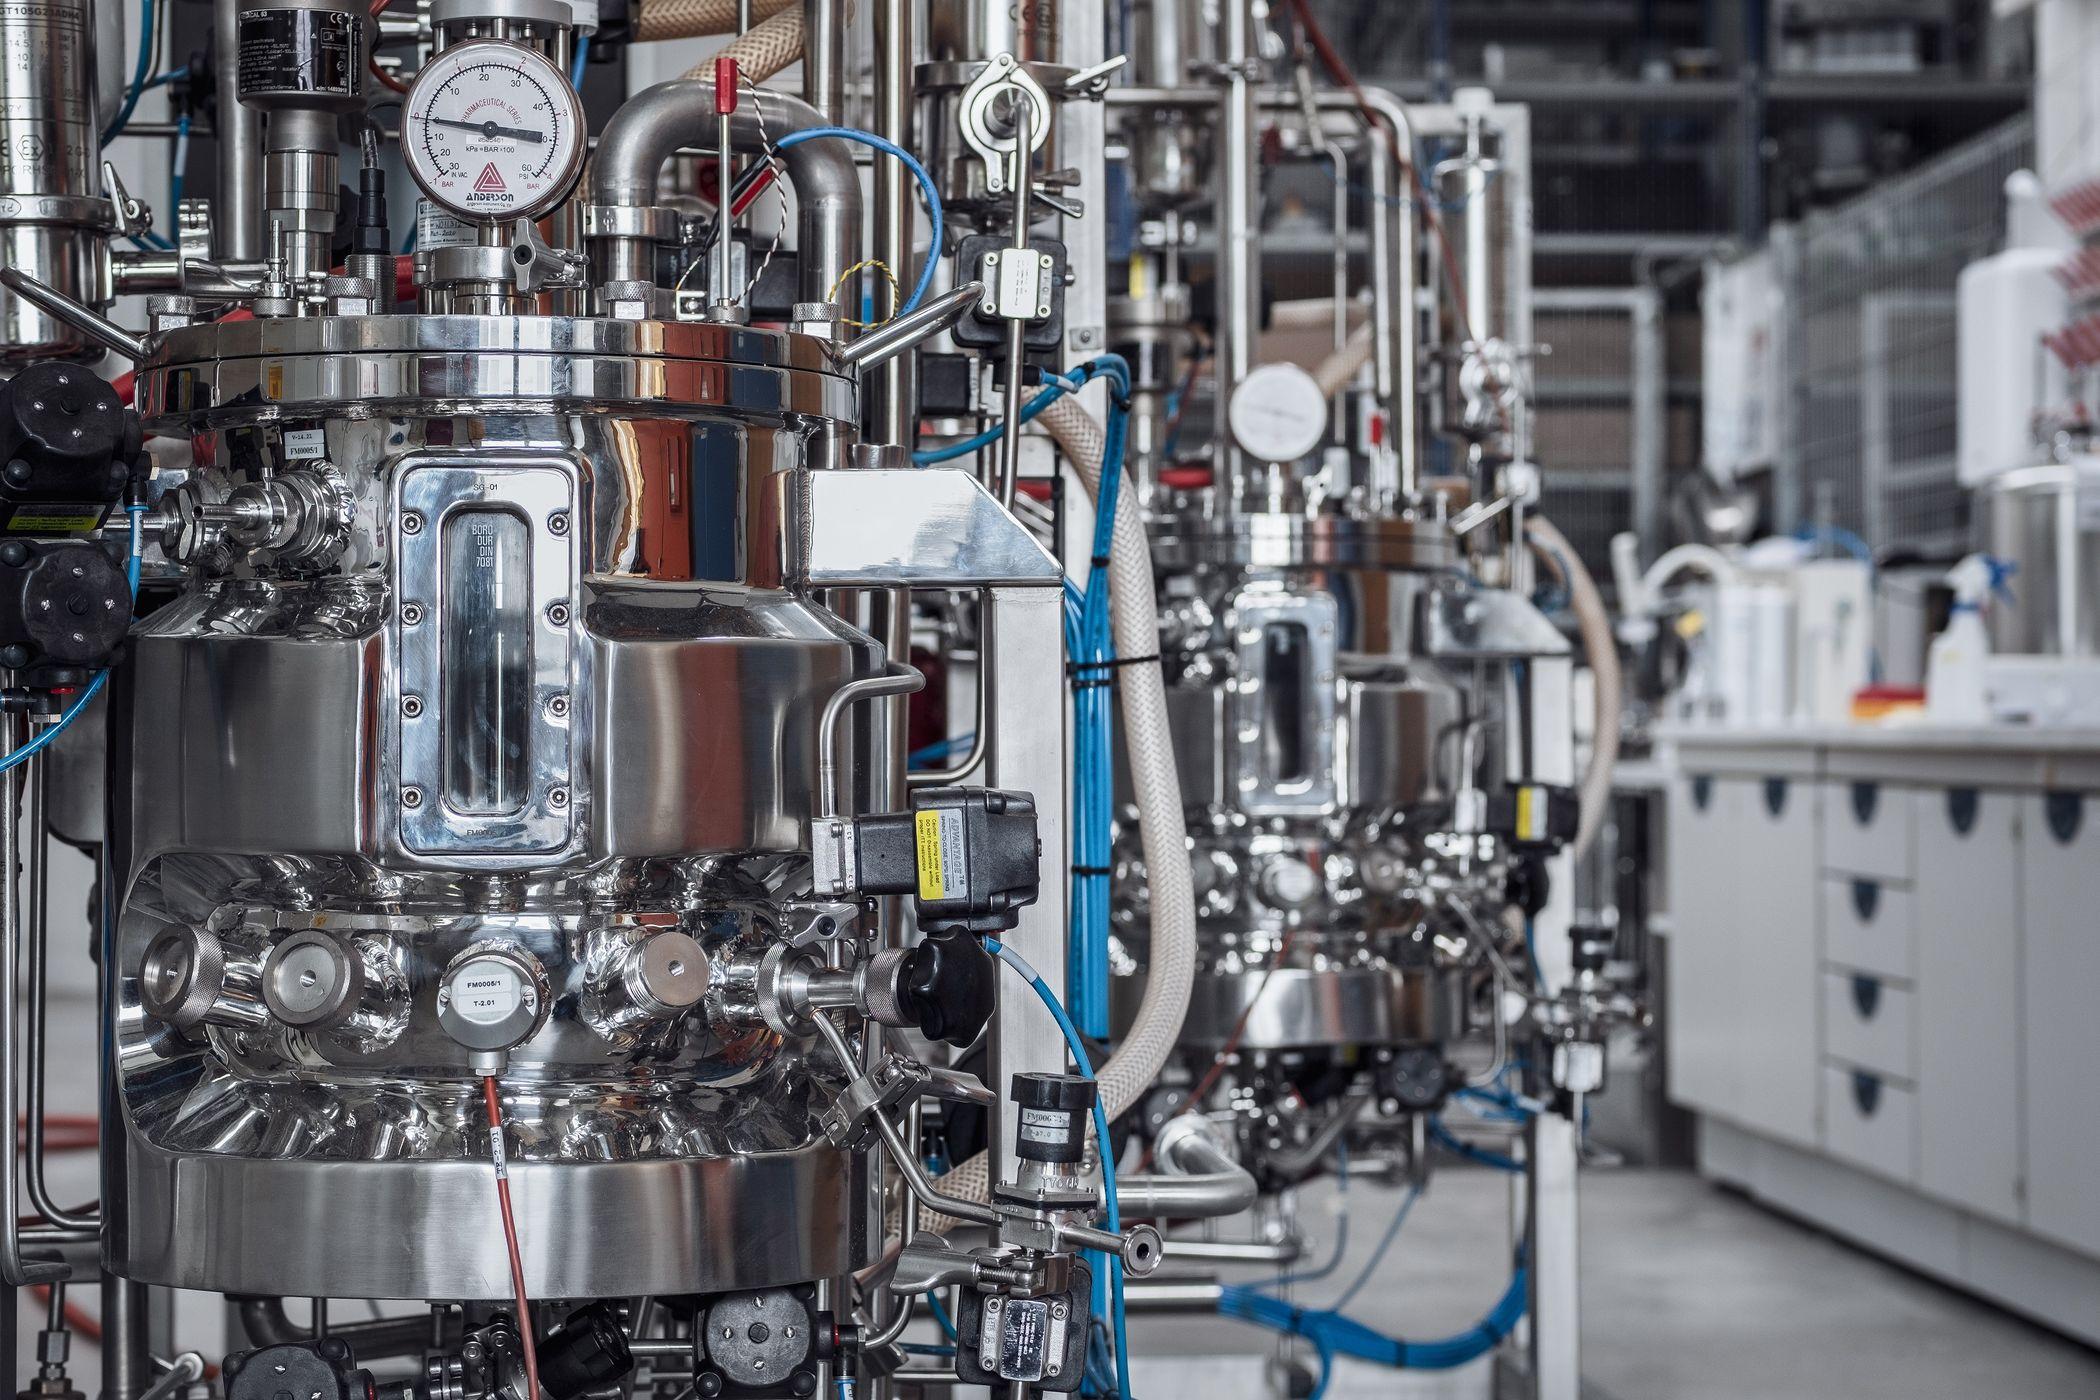 Bioreaktor von Evologic. © Michael Gizicki